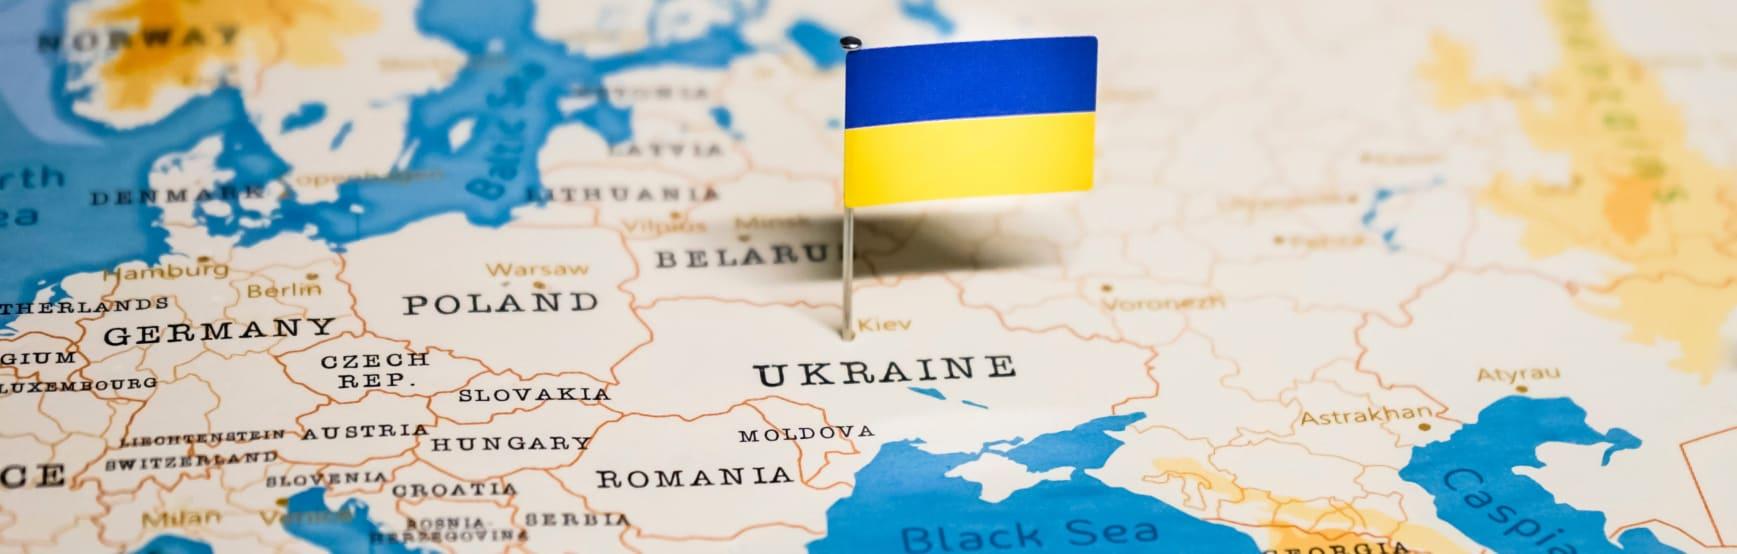 lvp ukraine 2C_572/2019